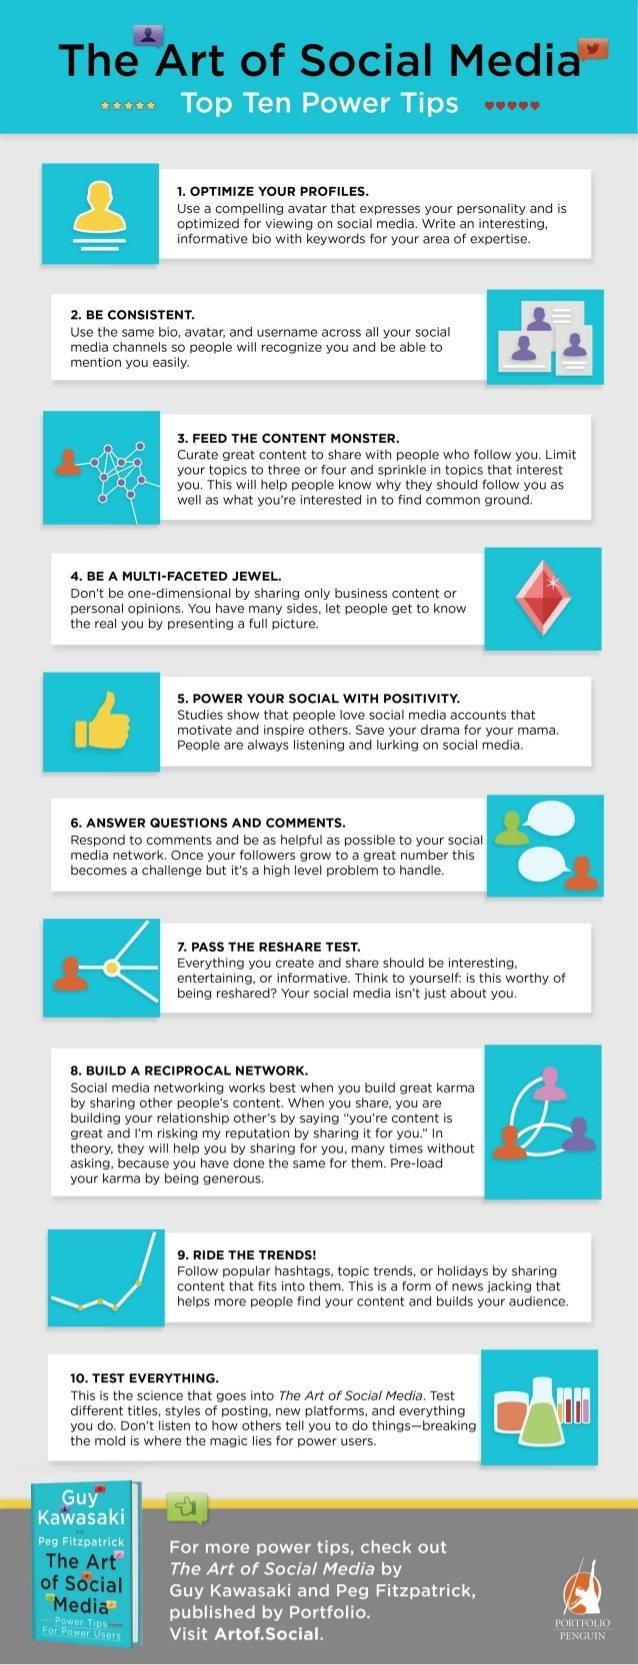 Top 10 power tips for #Social_Media #SMM #Infographic